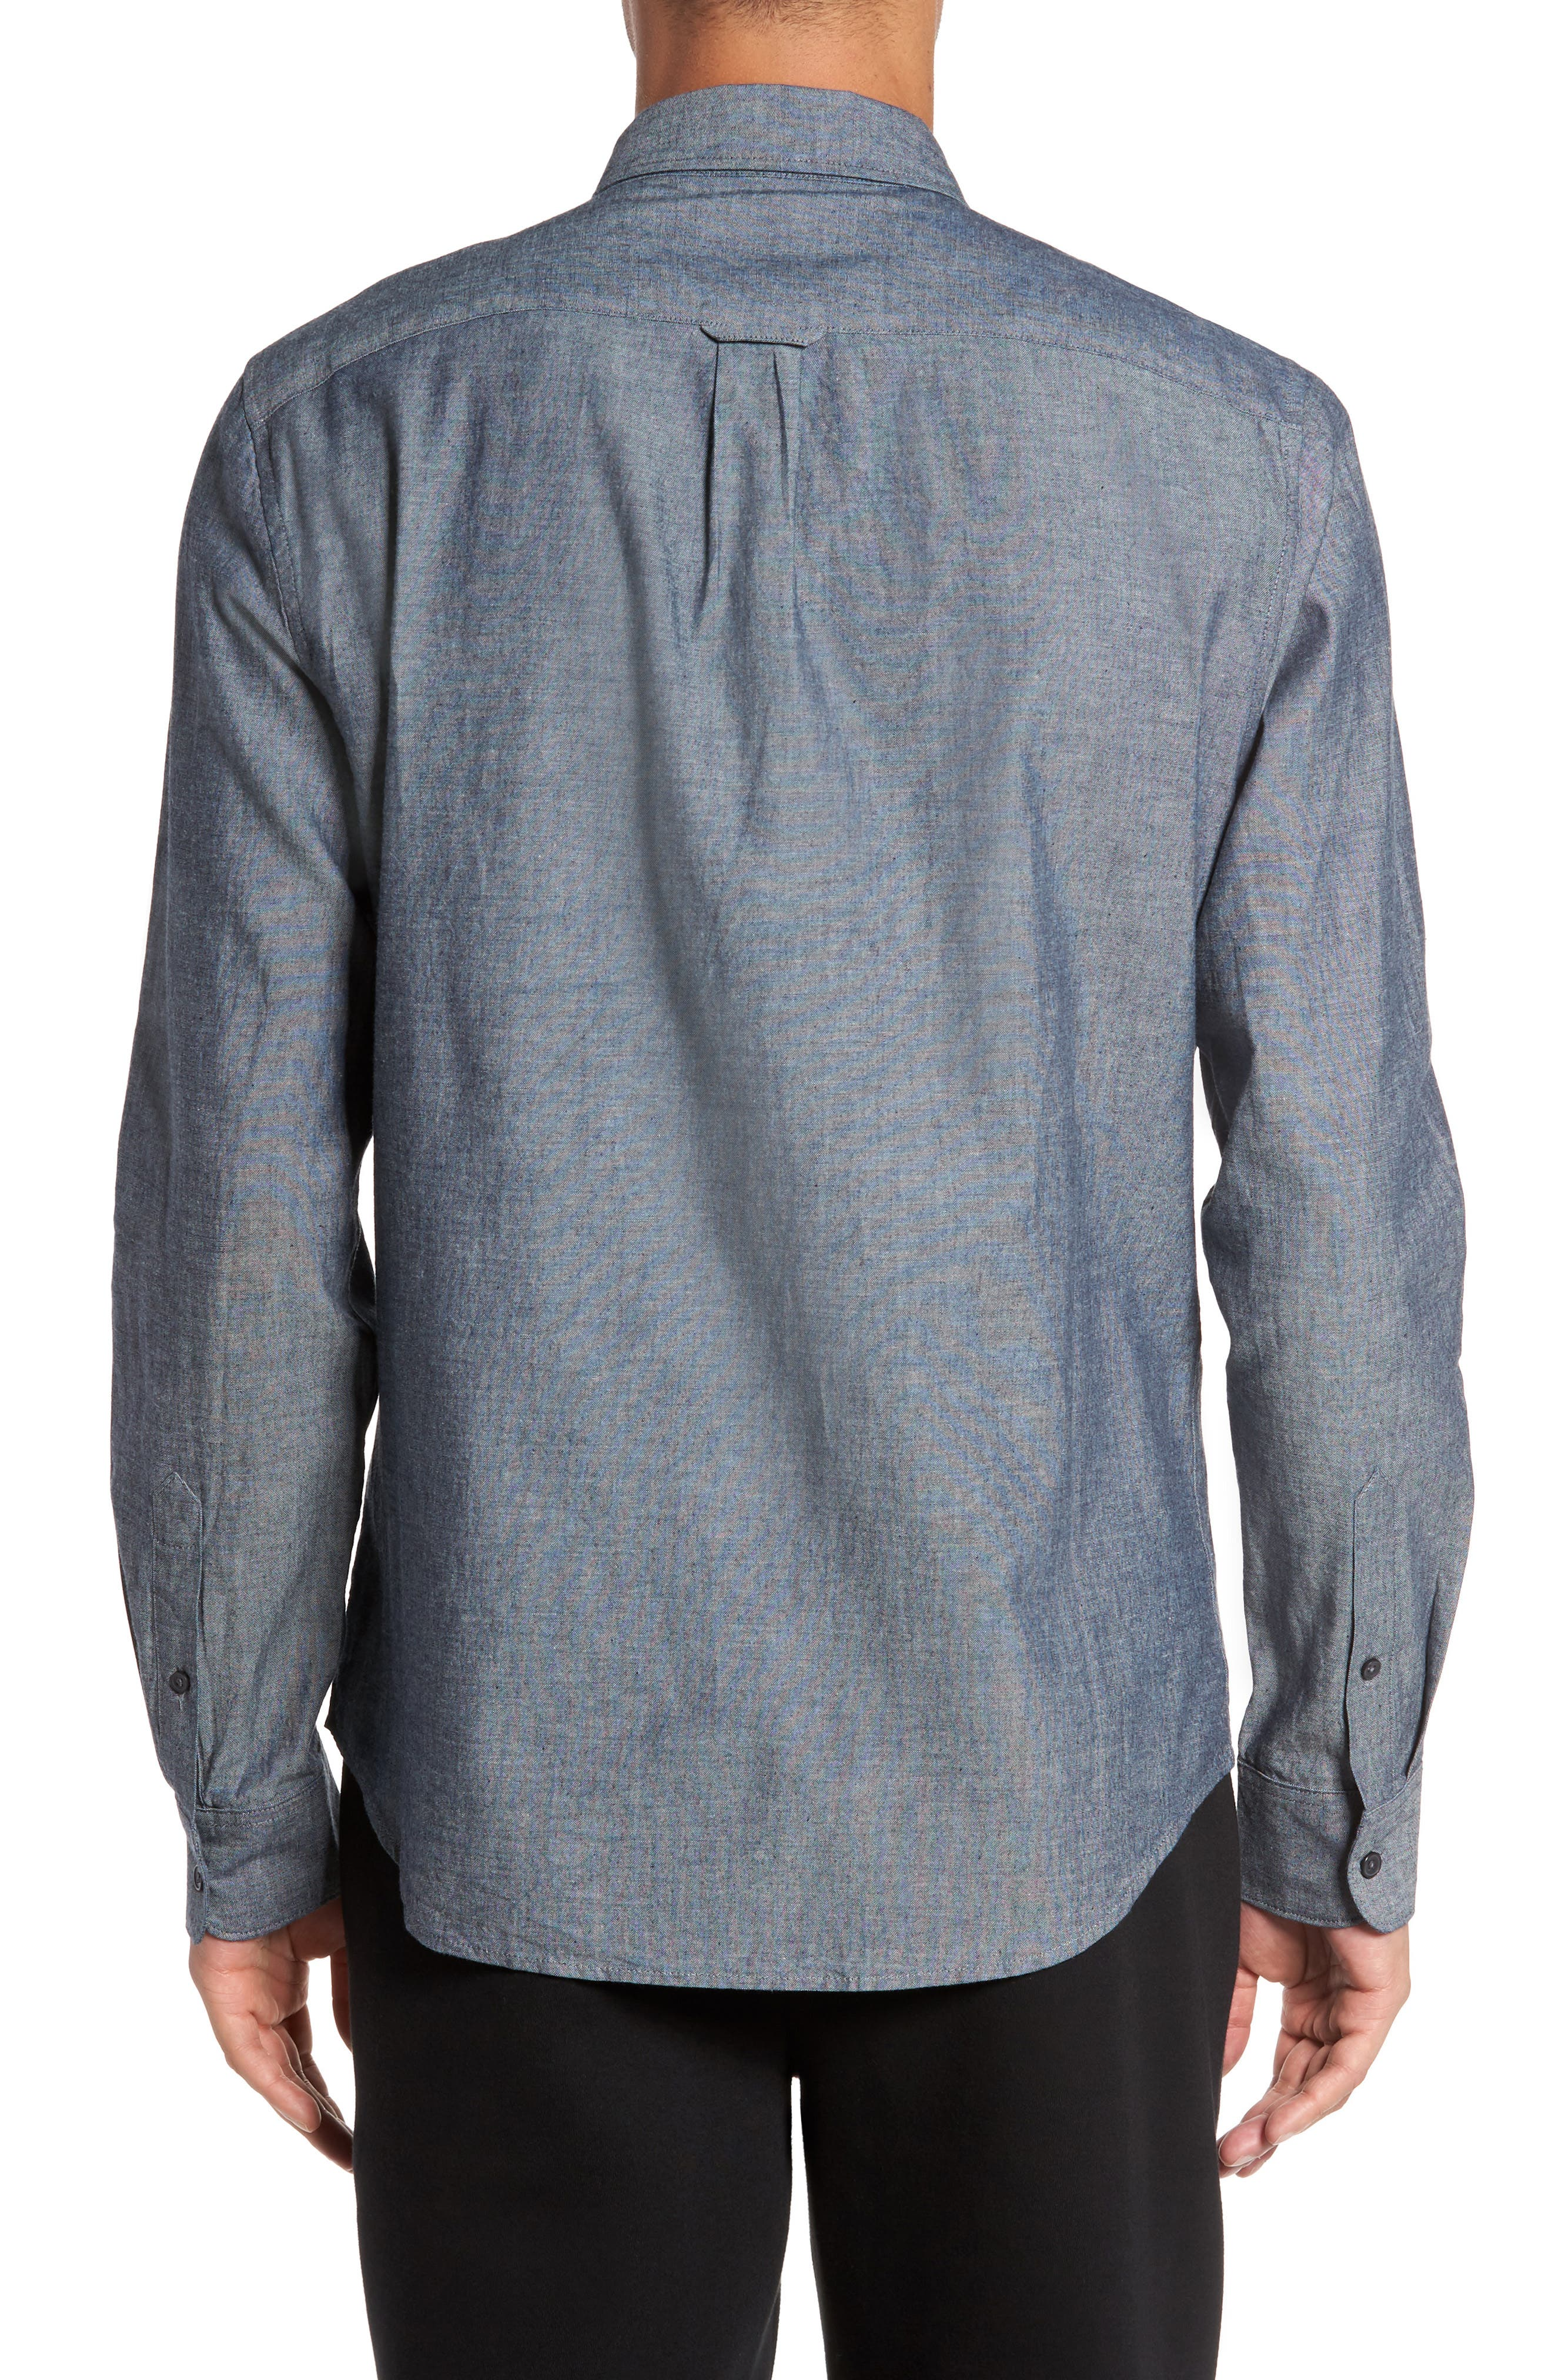 Alternate Image 2  - Everlane The Slim Fit Chambray Shirt